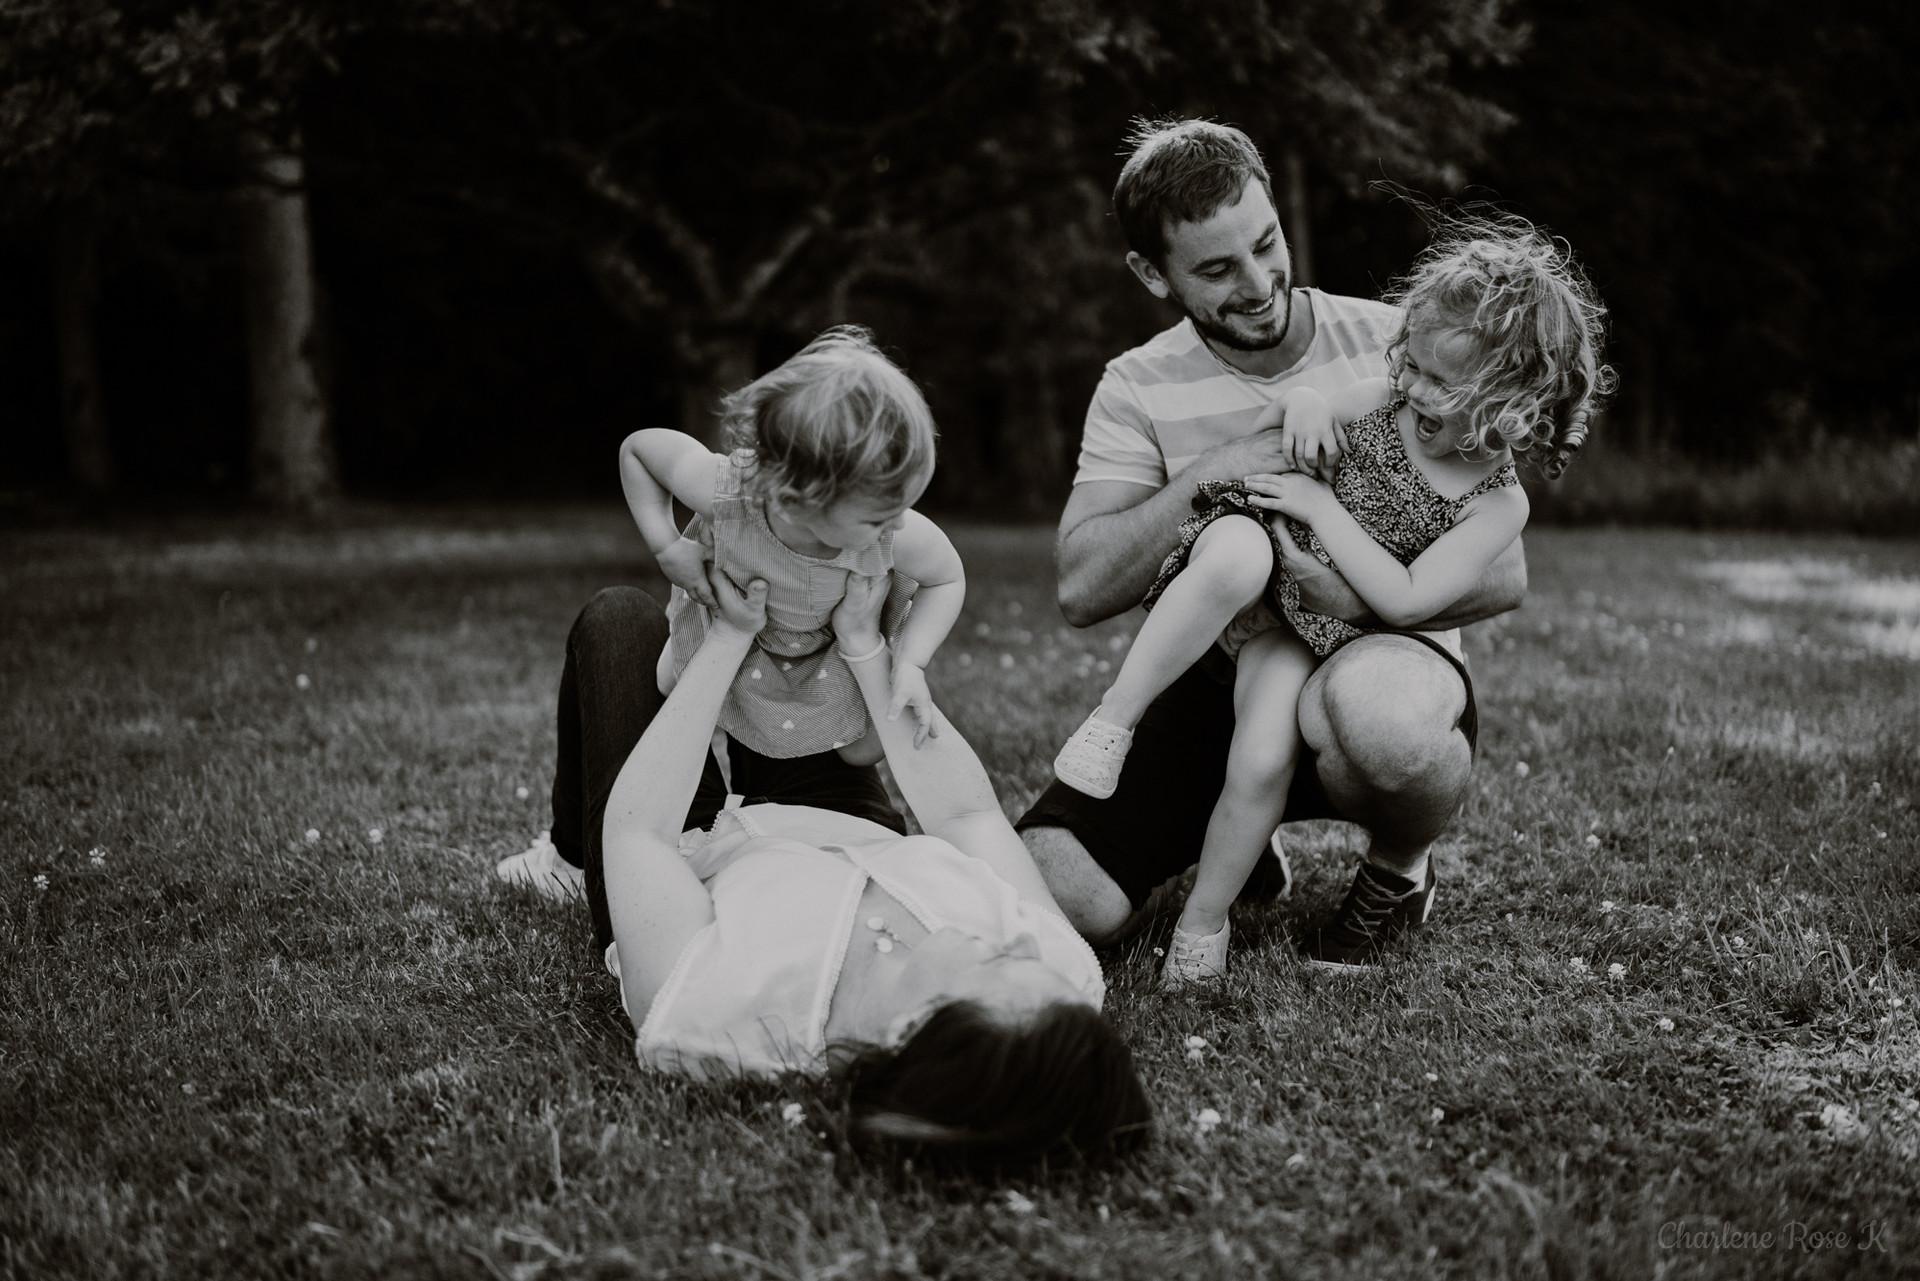 photographe-troyes-famille-enfants-domicile-crk-11